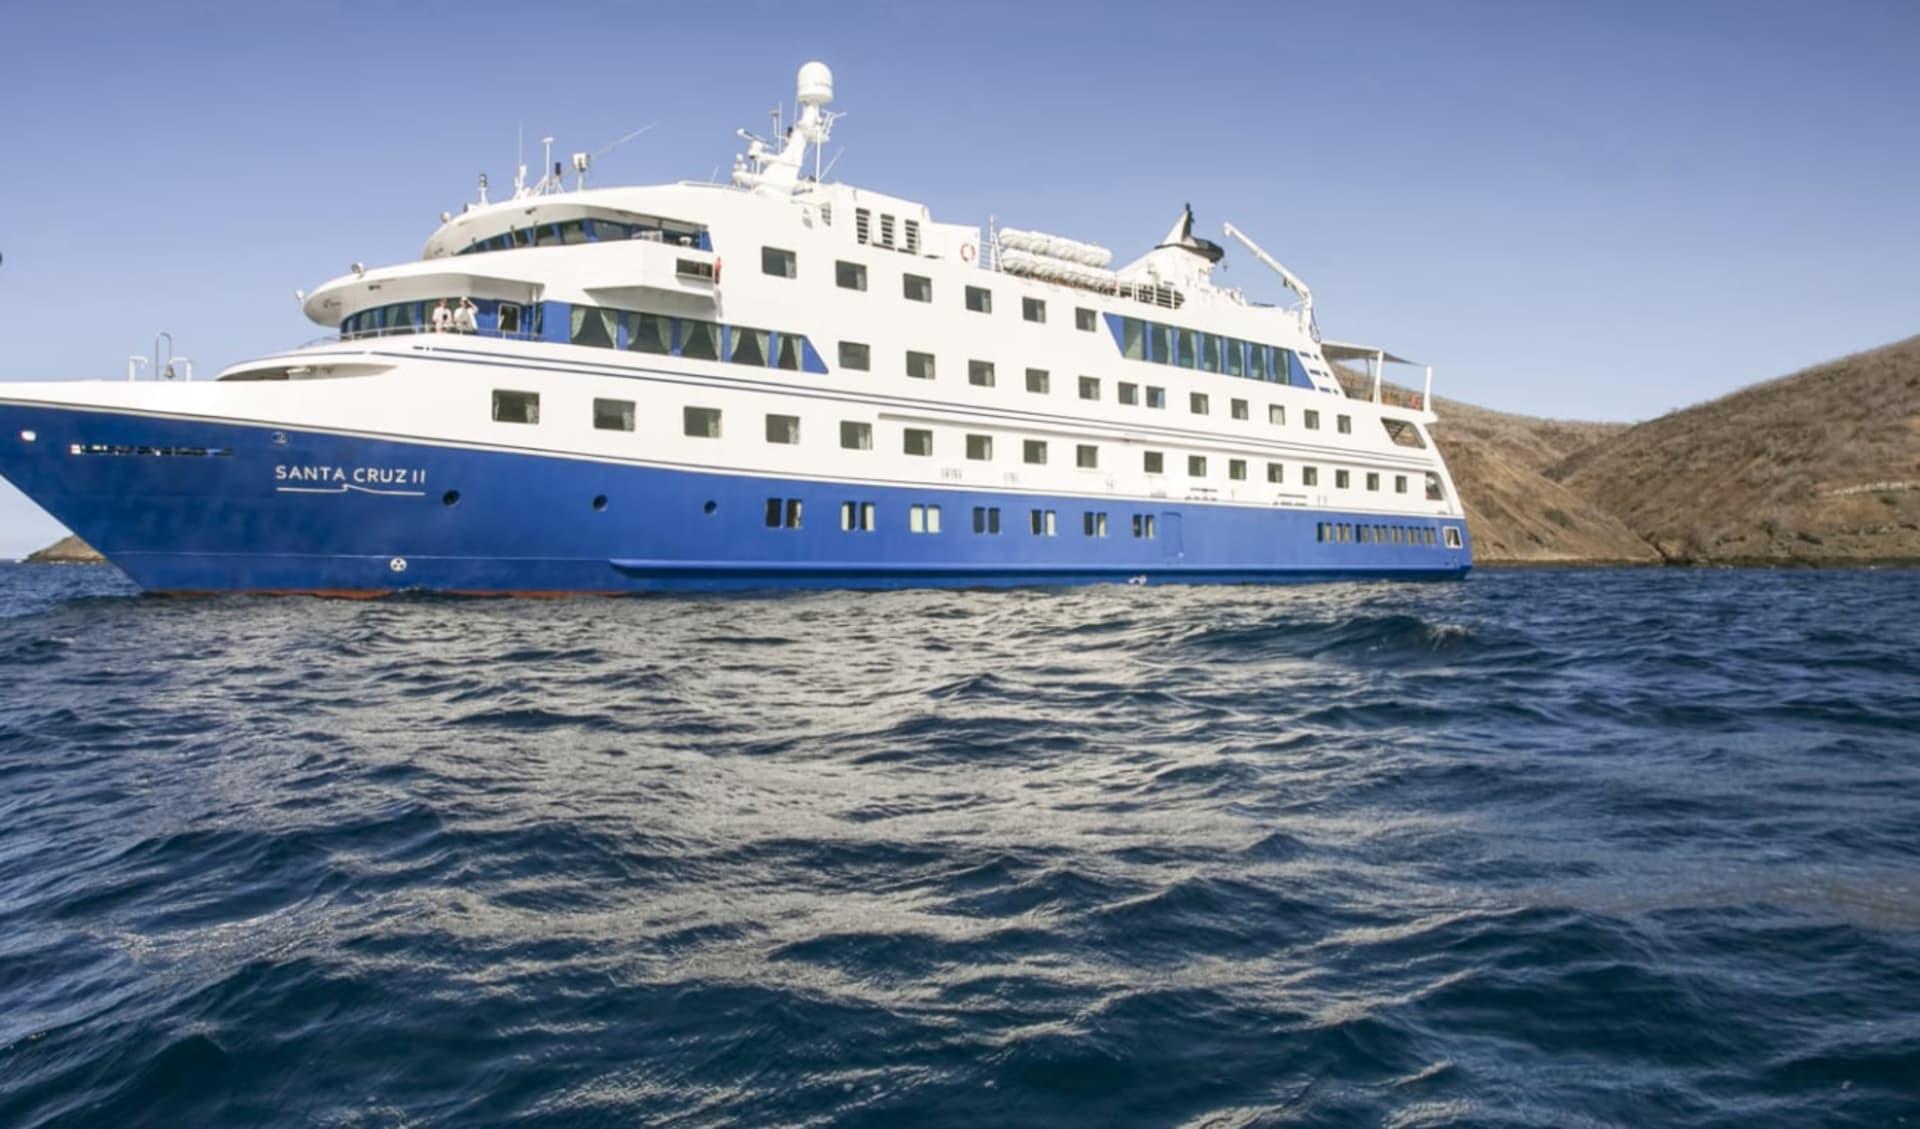 M/V Santa Cruz II ab Kreuzfahrten: Santa Cruz II